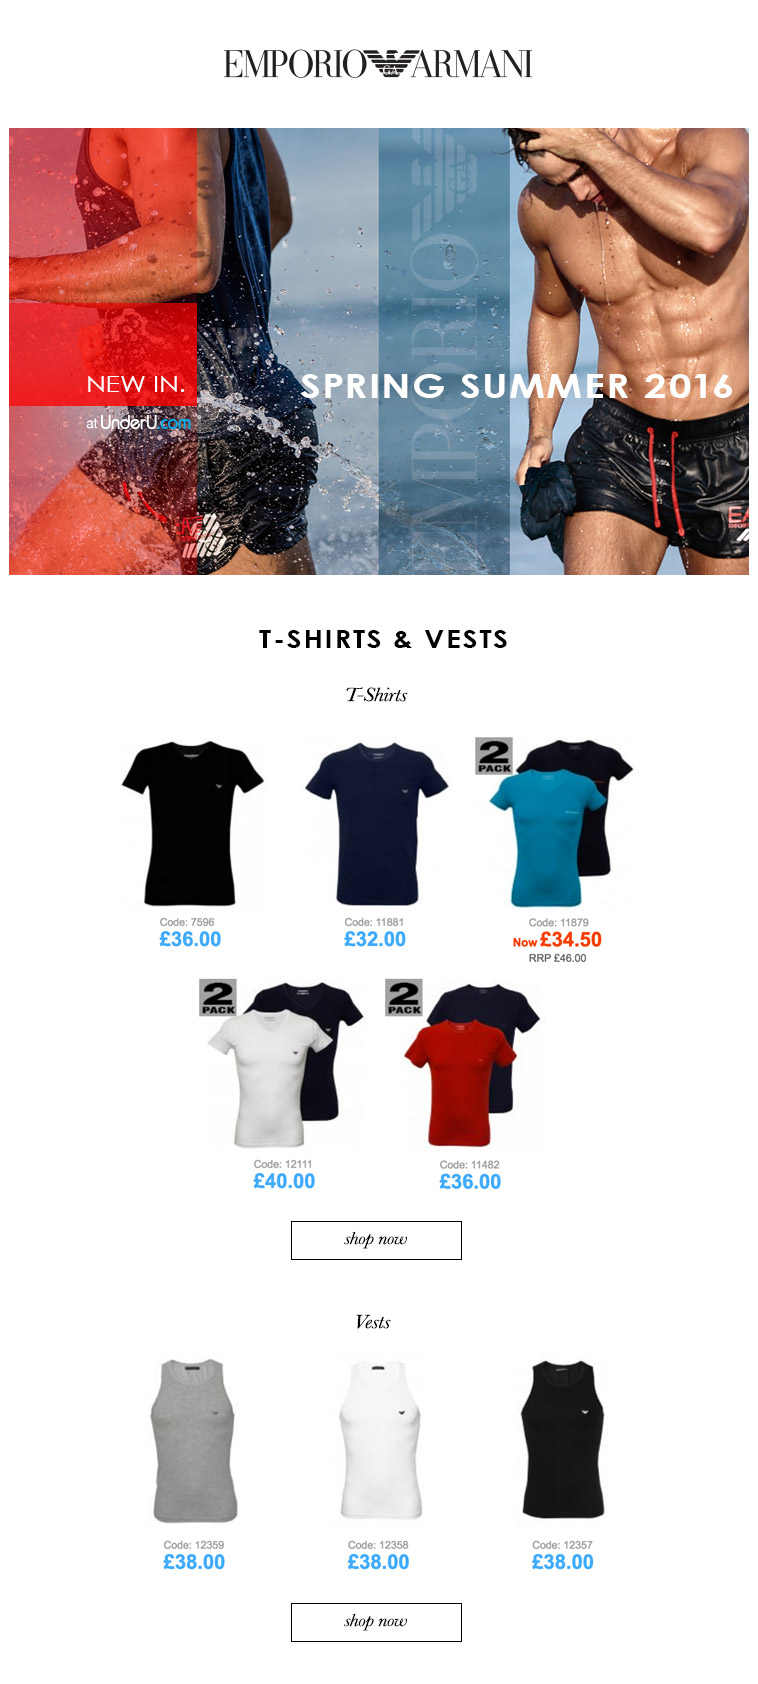 Emporio Armani Men's T-Shirts | Blog News | UnderU